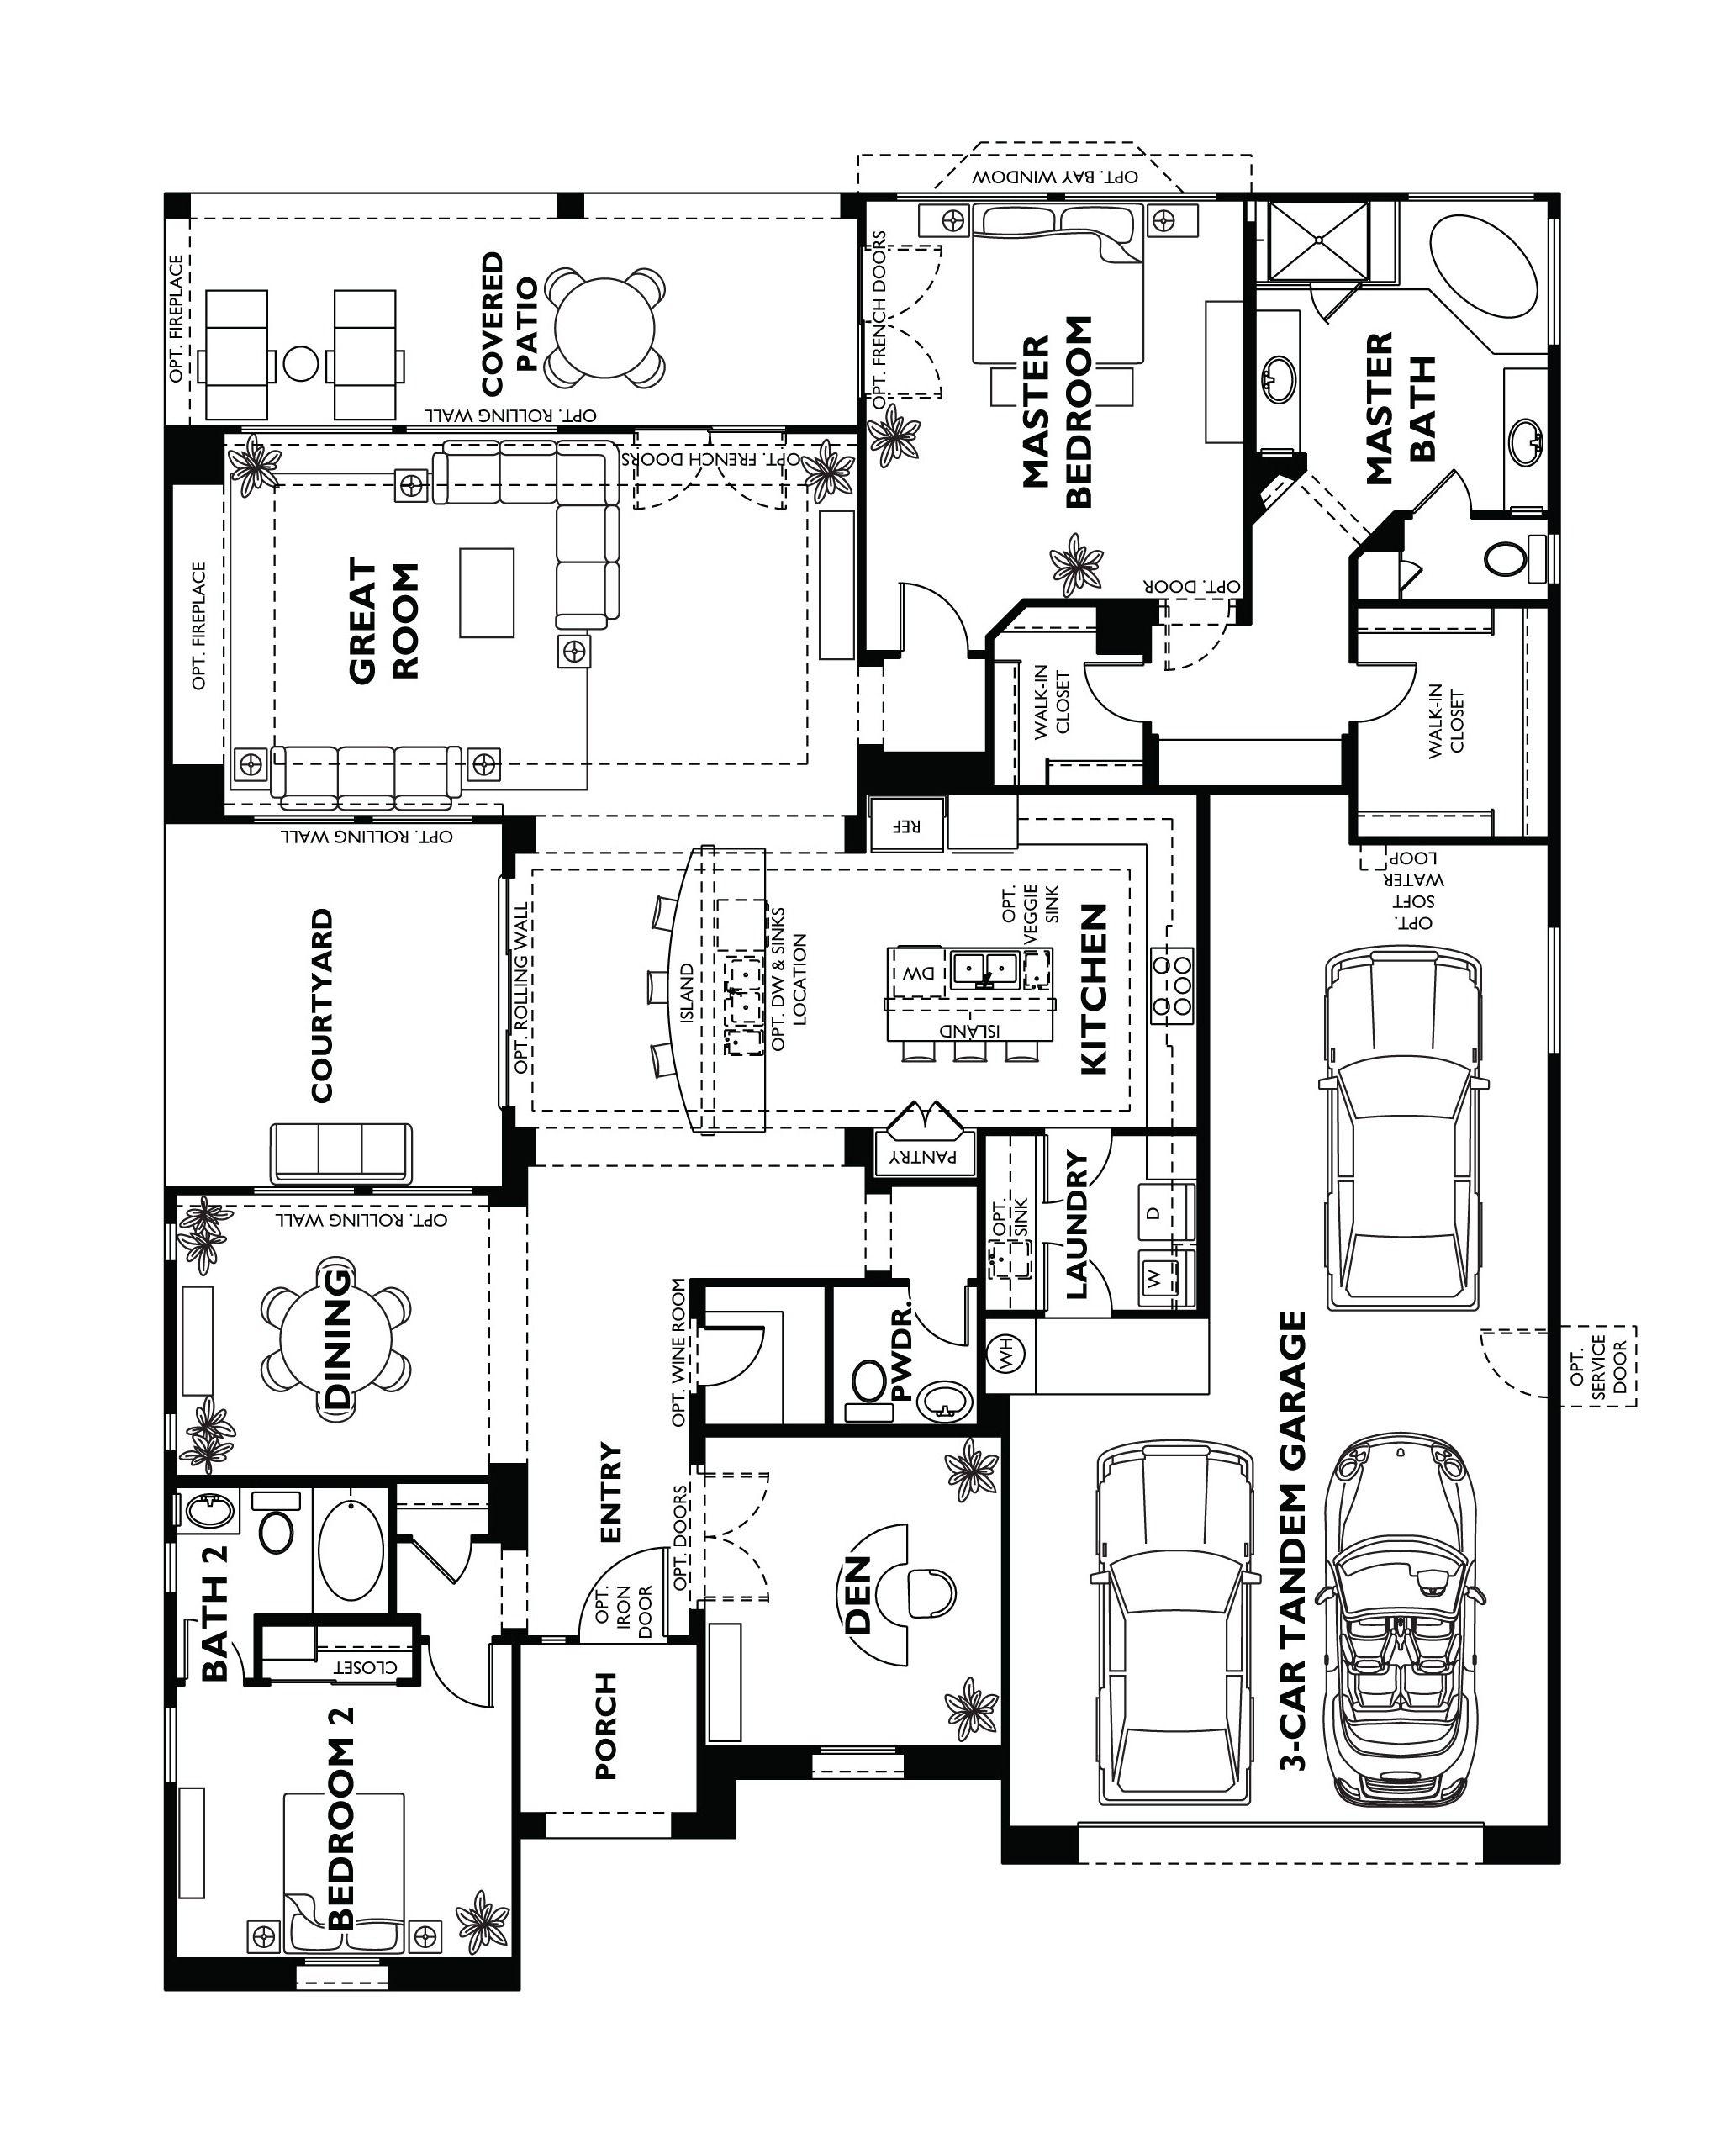 Trilogy At Vistancia Tarragona Floor Plan Shea Trilogy Vistancia Home House Floor Plans Model Homes Floorpl Floor Plans House Floor Plans Mountain House Plans